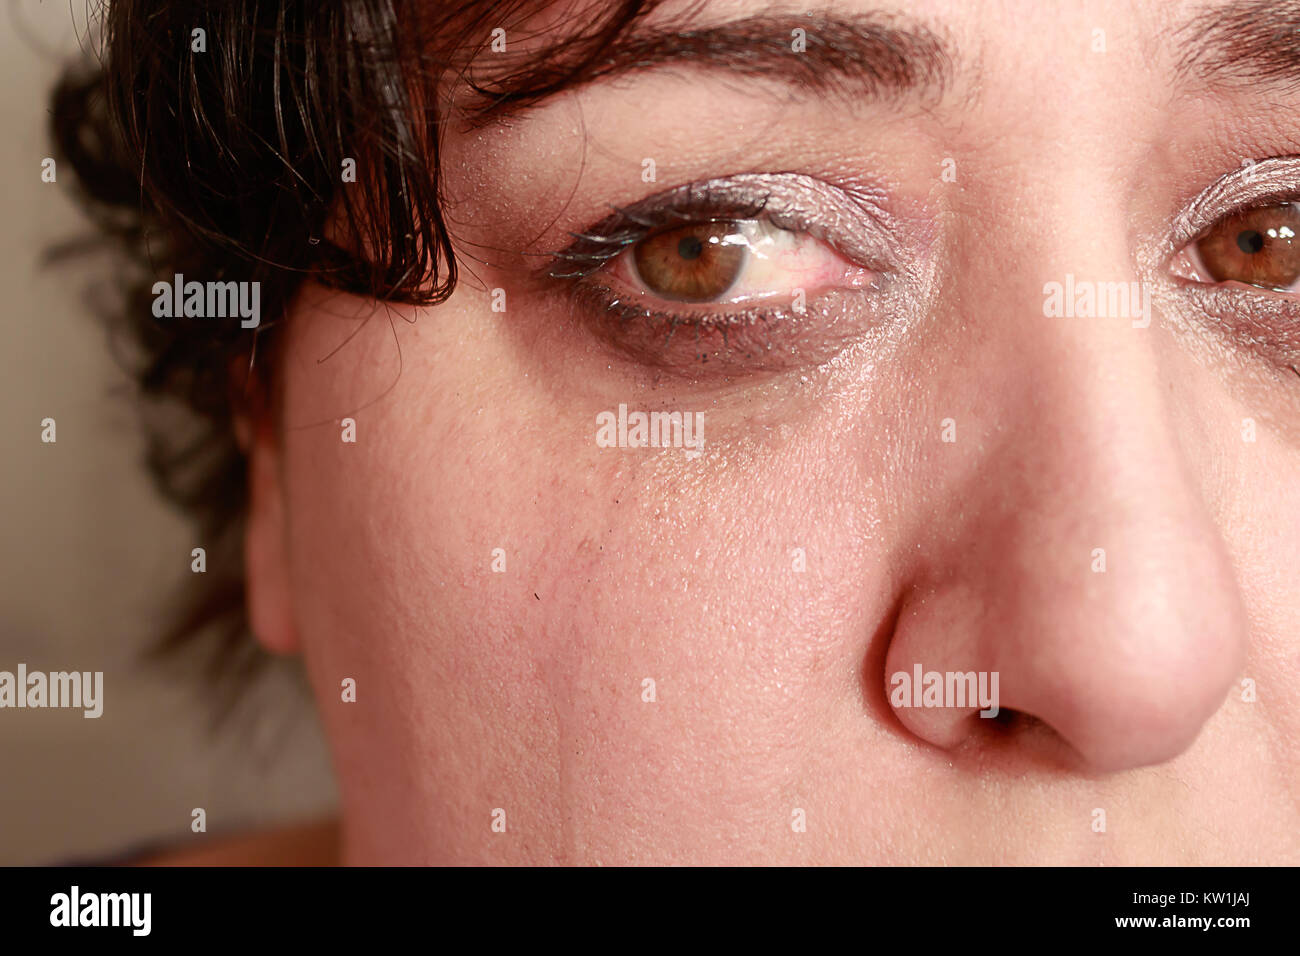 crying eyes  of woman - Stock Image